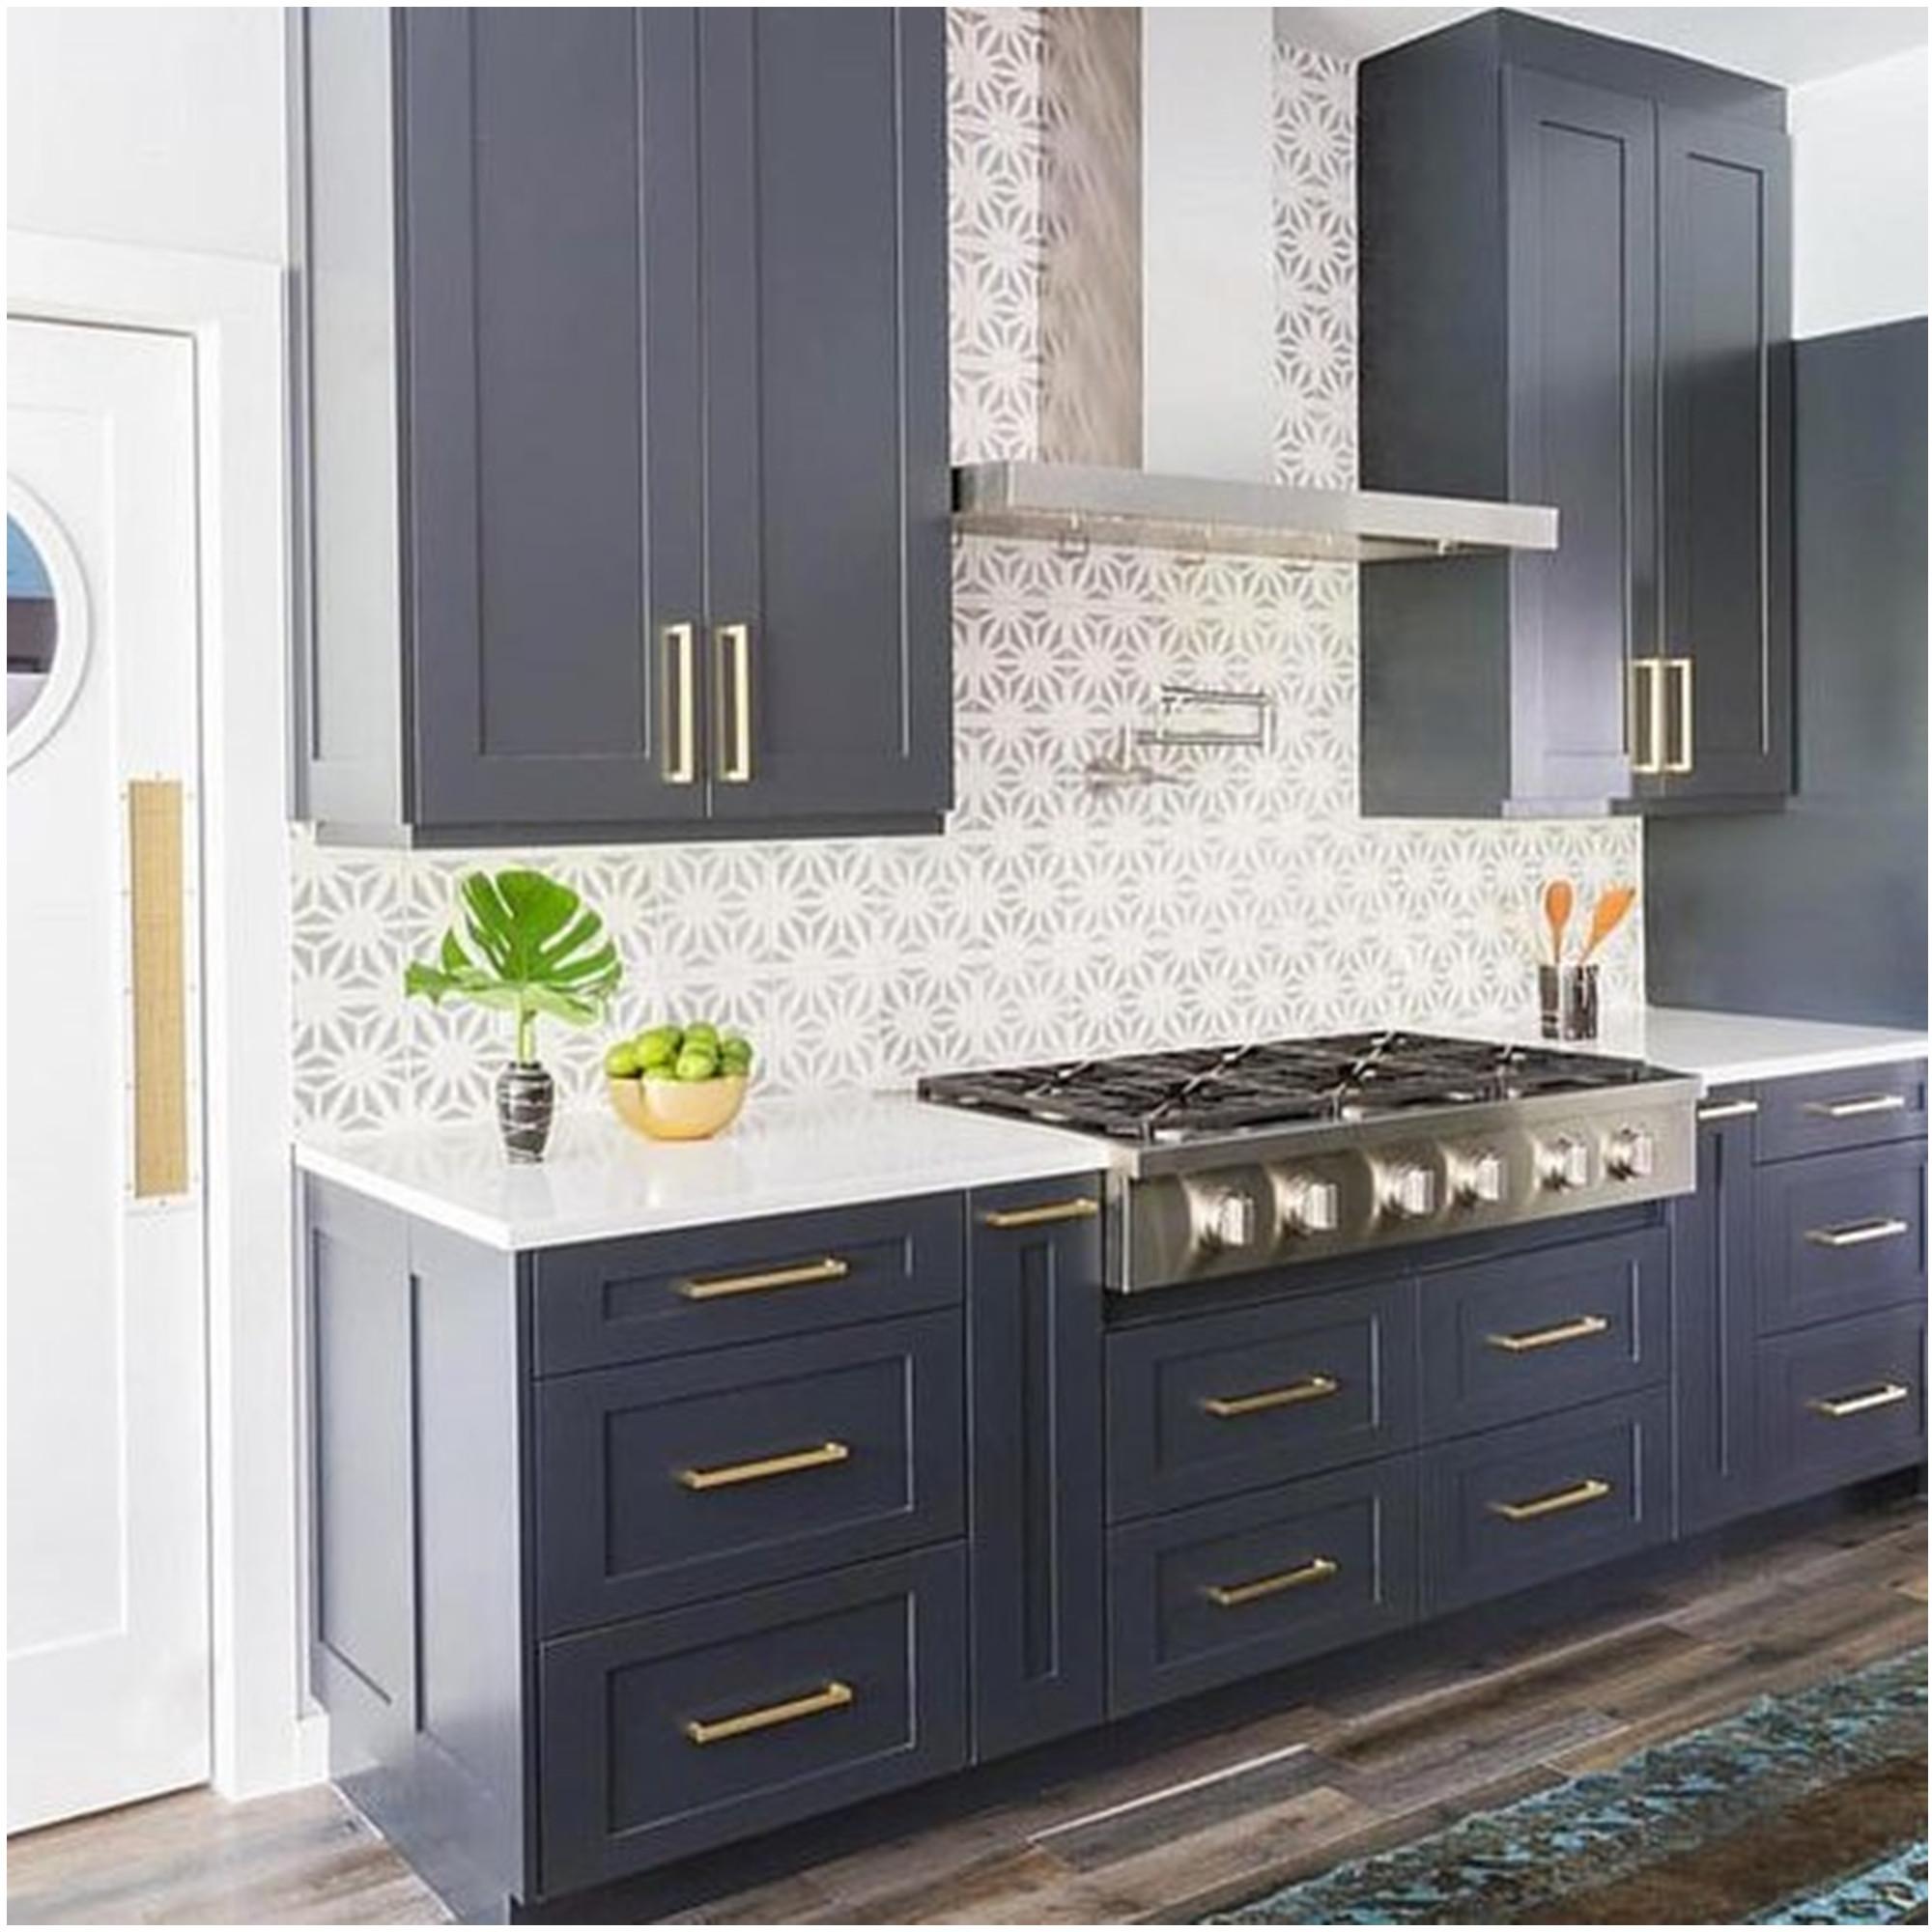 Modern Navy Blue Kitchen Cabinet Shaker Kitchen Pantry Cupboards For Sale Buy Blue Kitchen Cabinets Kitchen Cabinet Shaker Kitchen Pantry Kitchen Cabinet Shaker Navy Blue Apartment Kitchen Custom Kitchen Islands For Sale Kitchen